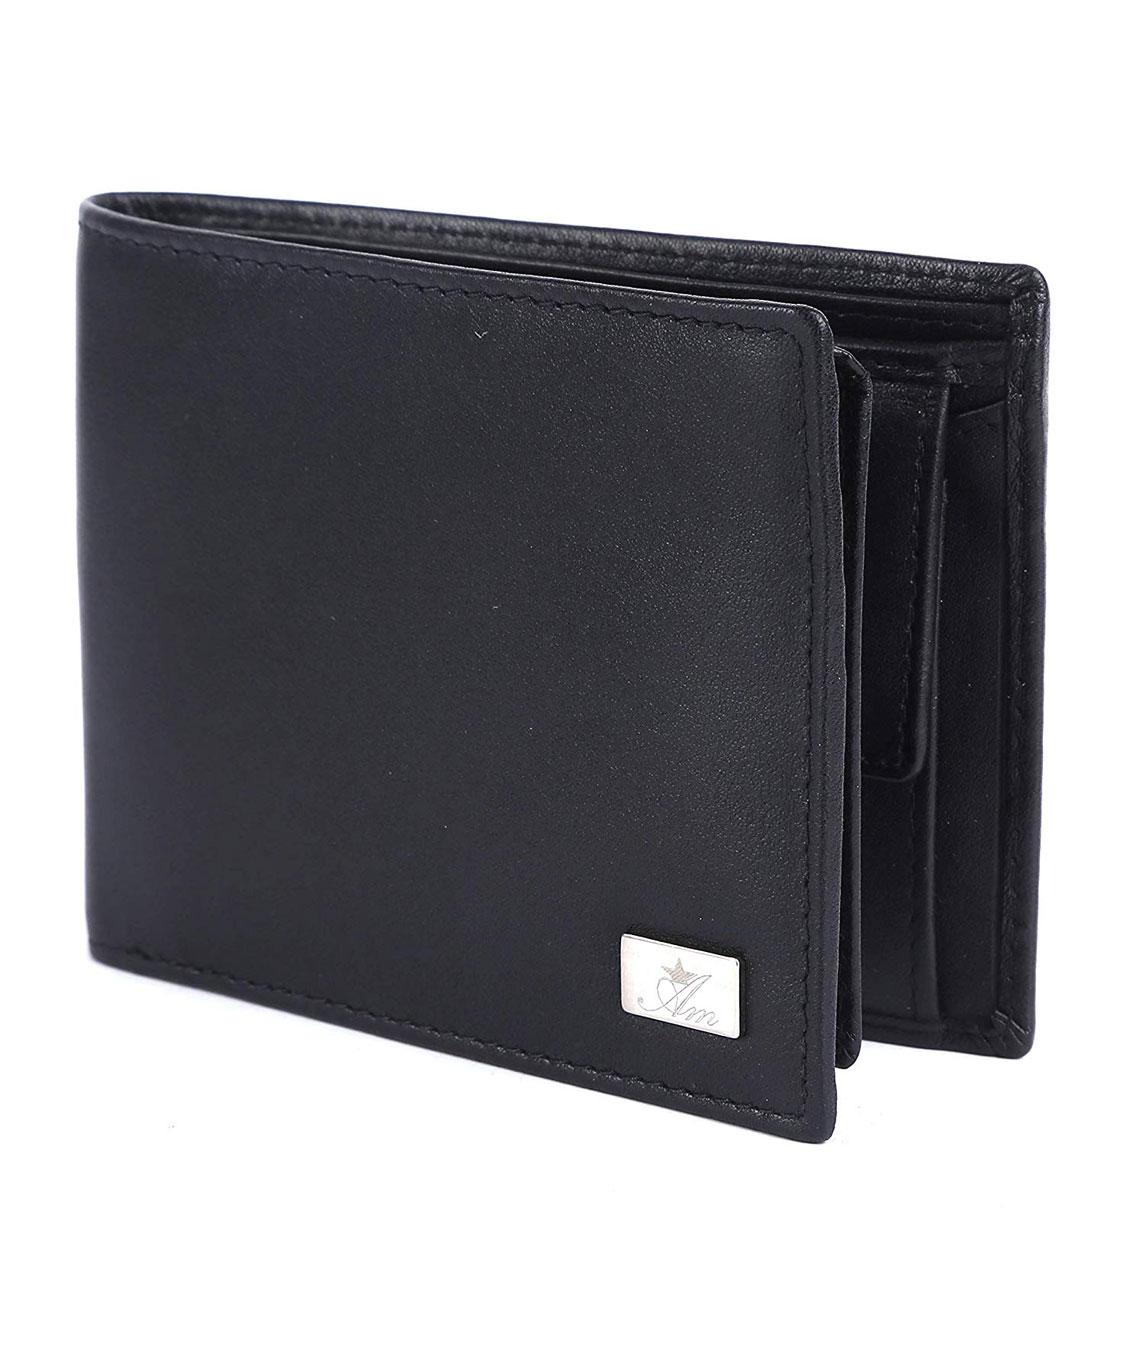 AM LEATHER Black Men`s Wallet